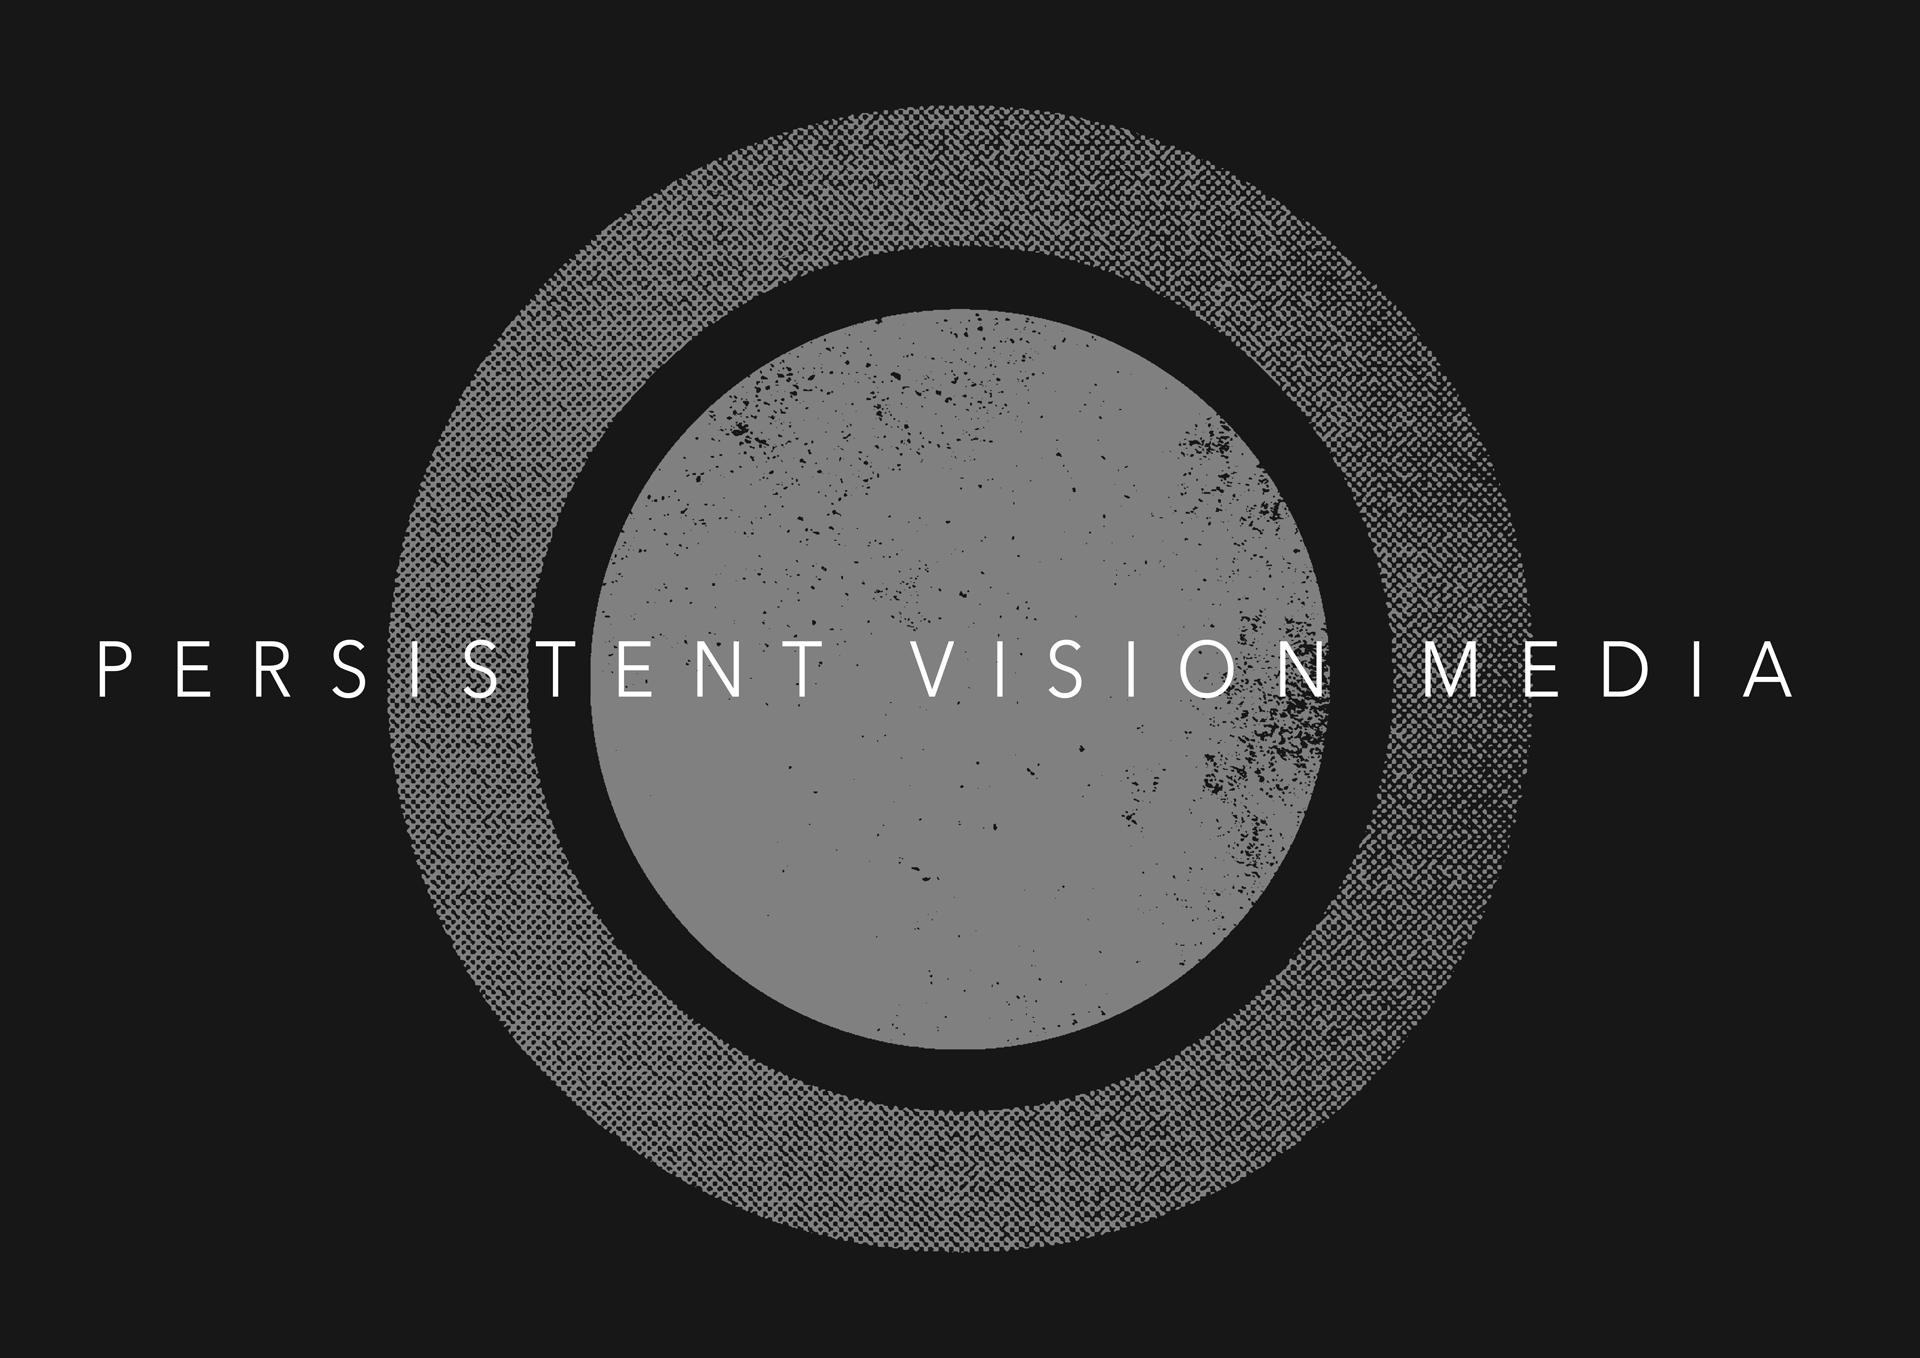 PersistentVisionMedia_LOGO1920.png